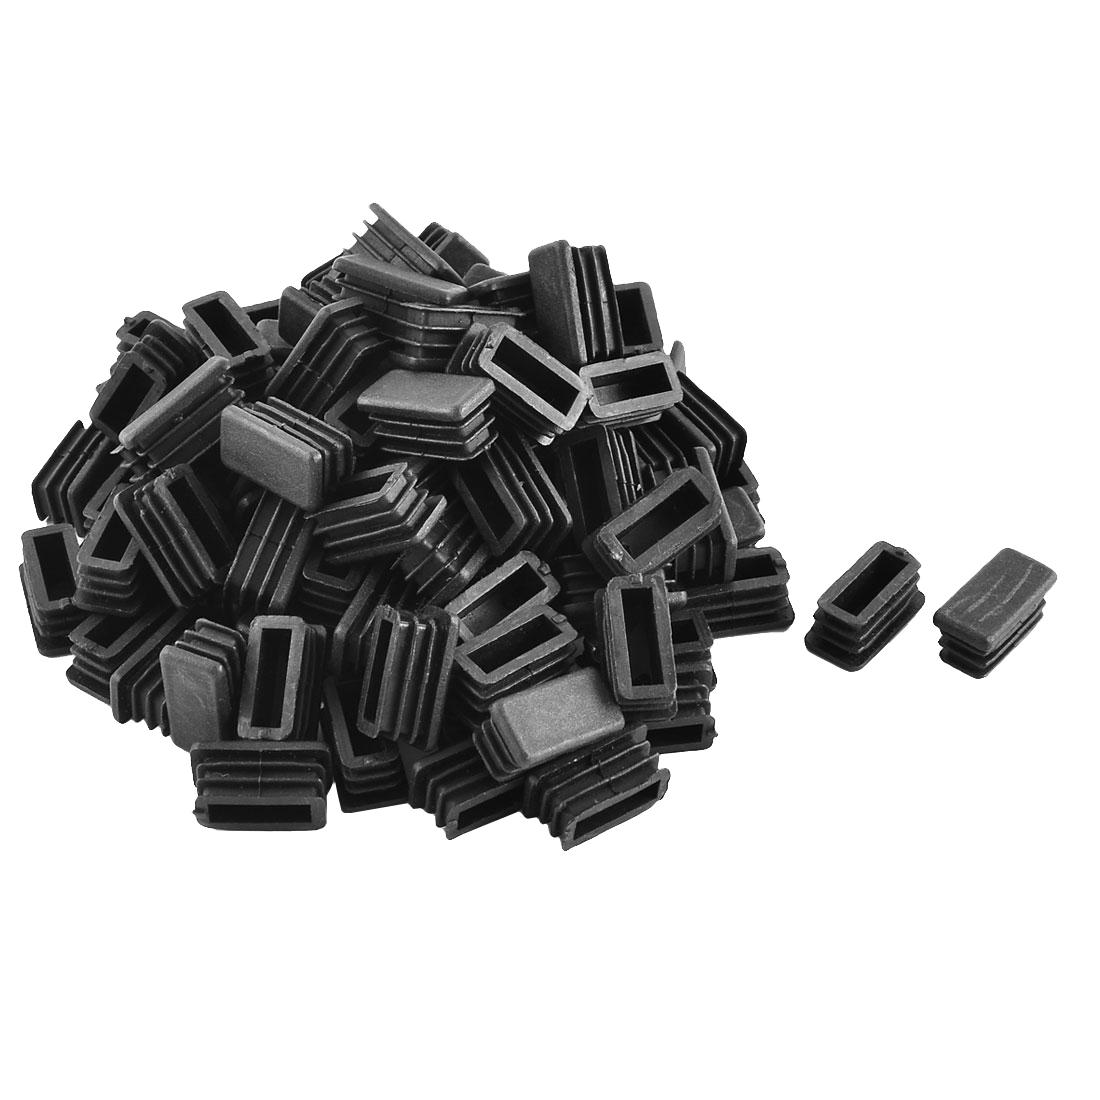 Plastic Rectangle Tube Pipe Inserts End Blanking Cap Black 13mm x 26mm 100pcs